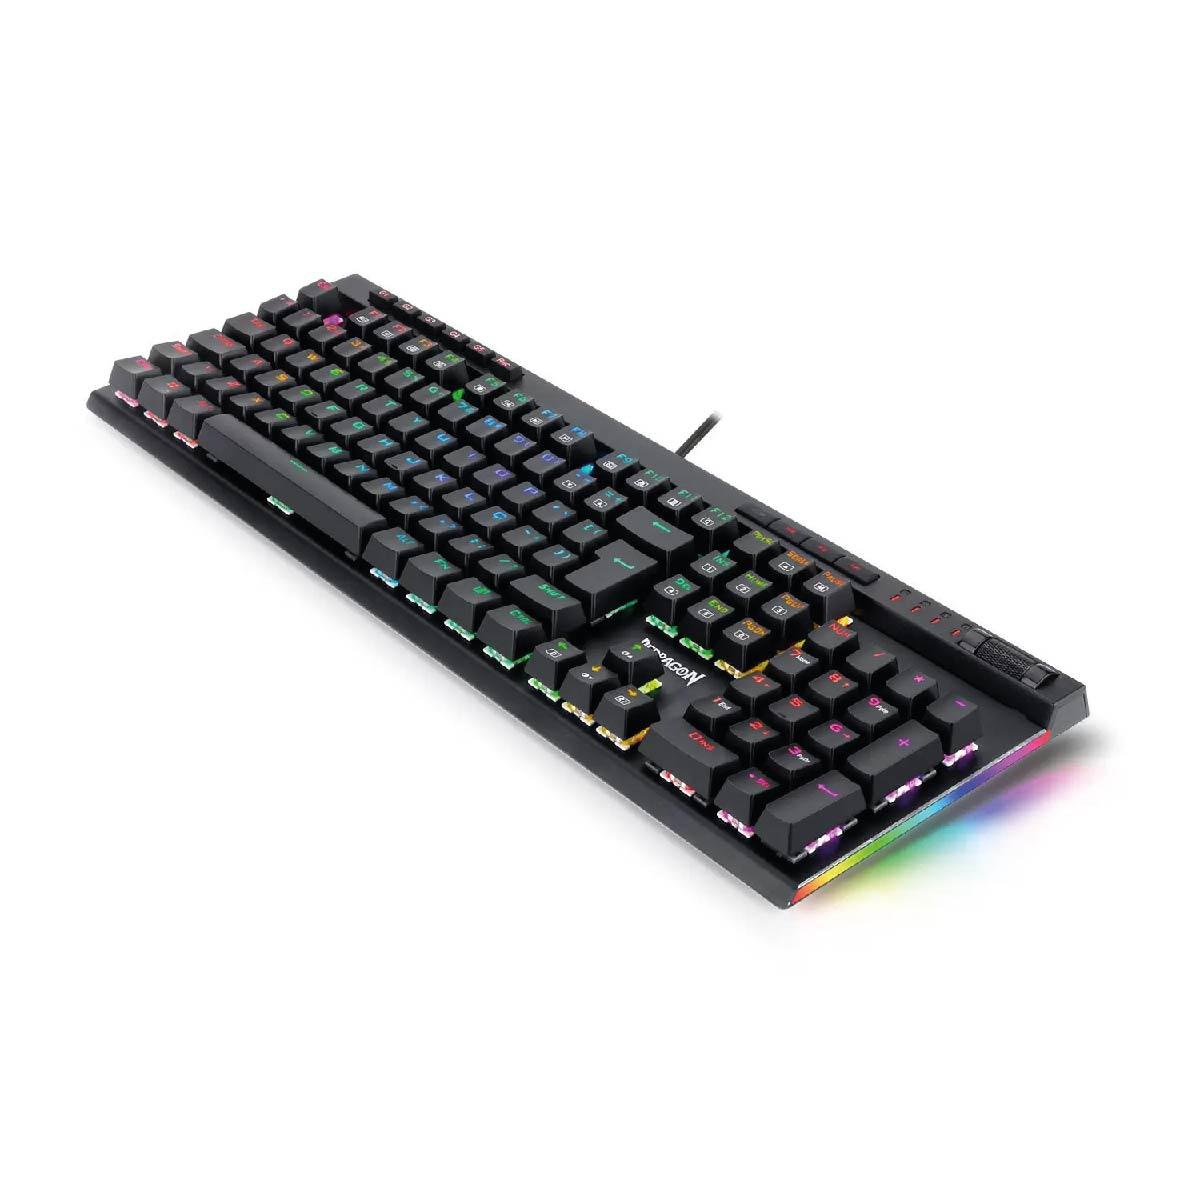 Teclado Gamer Vata Pró K580 Rgb Switch Óptico Redragon